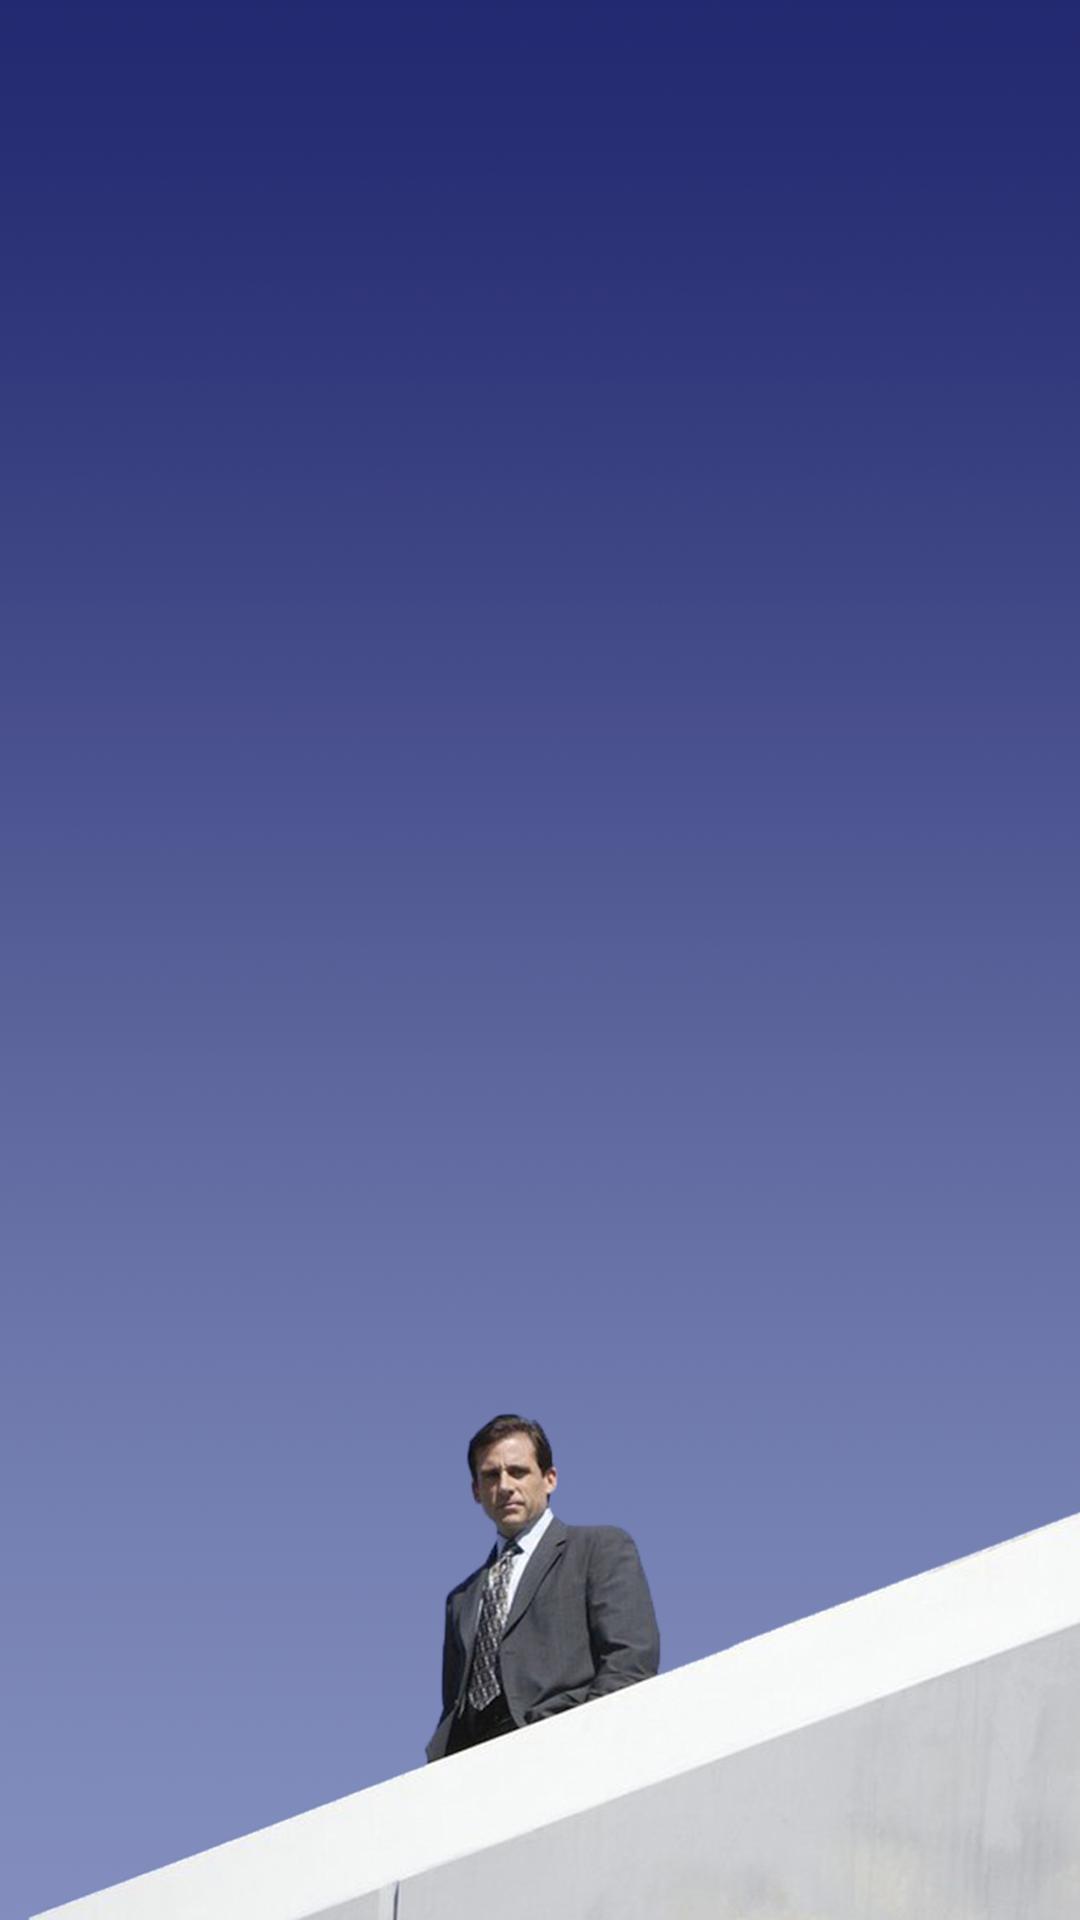 My new phone wallpaper   Album on Imgur 1080x1920